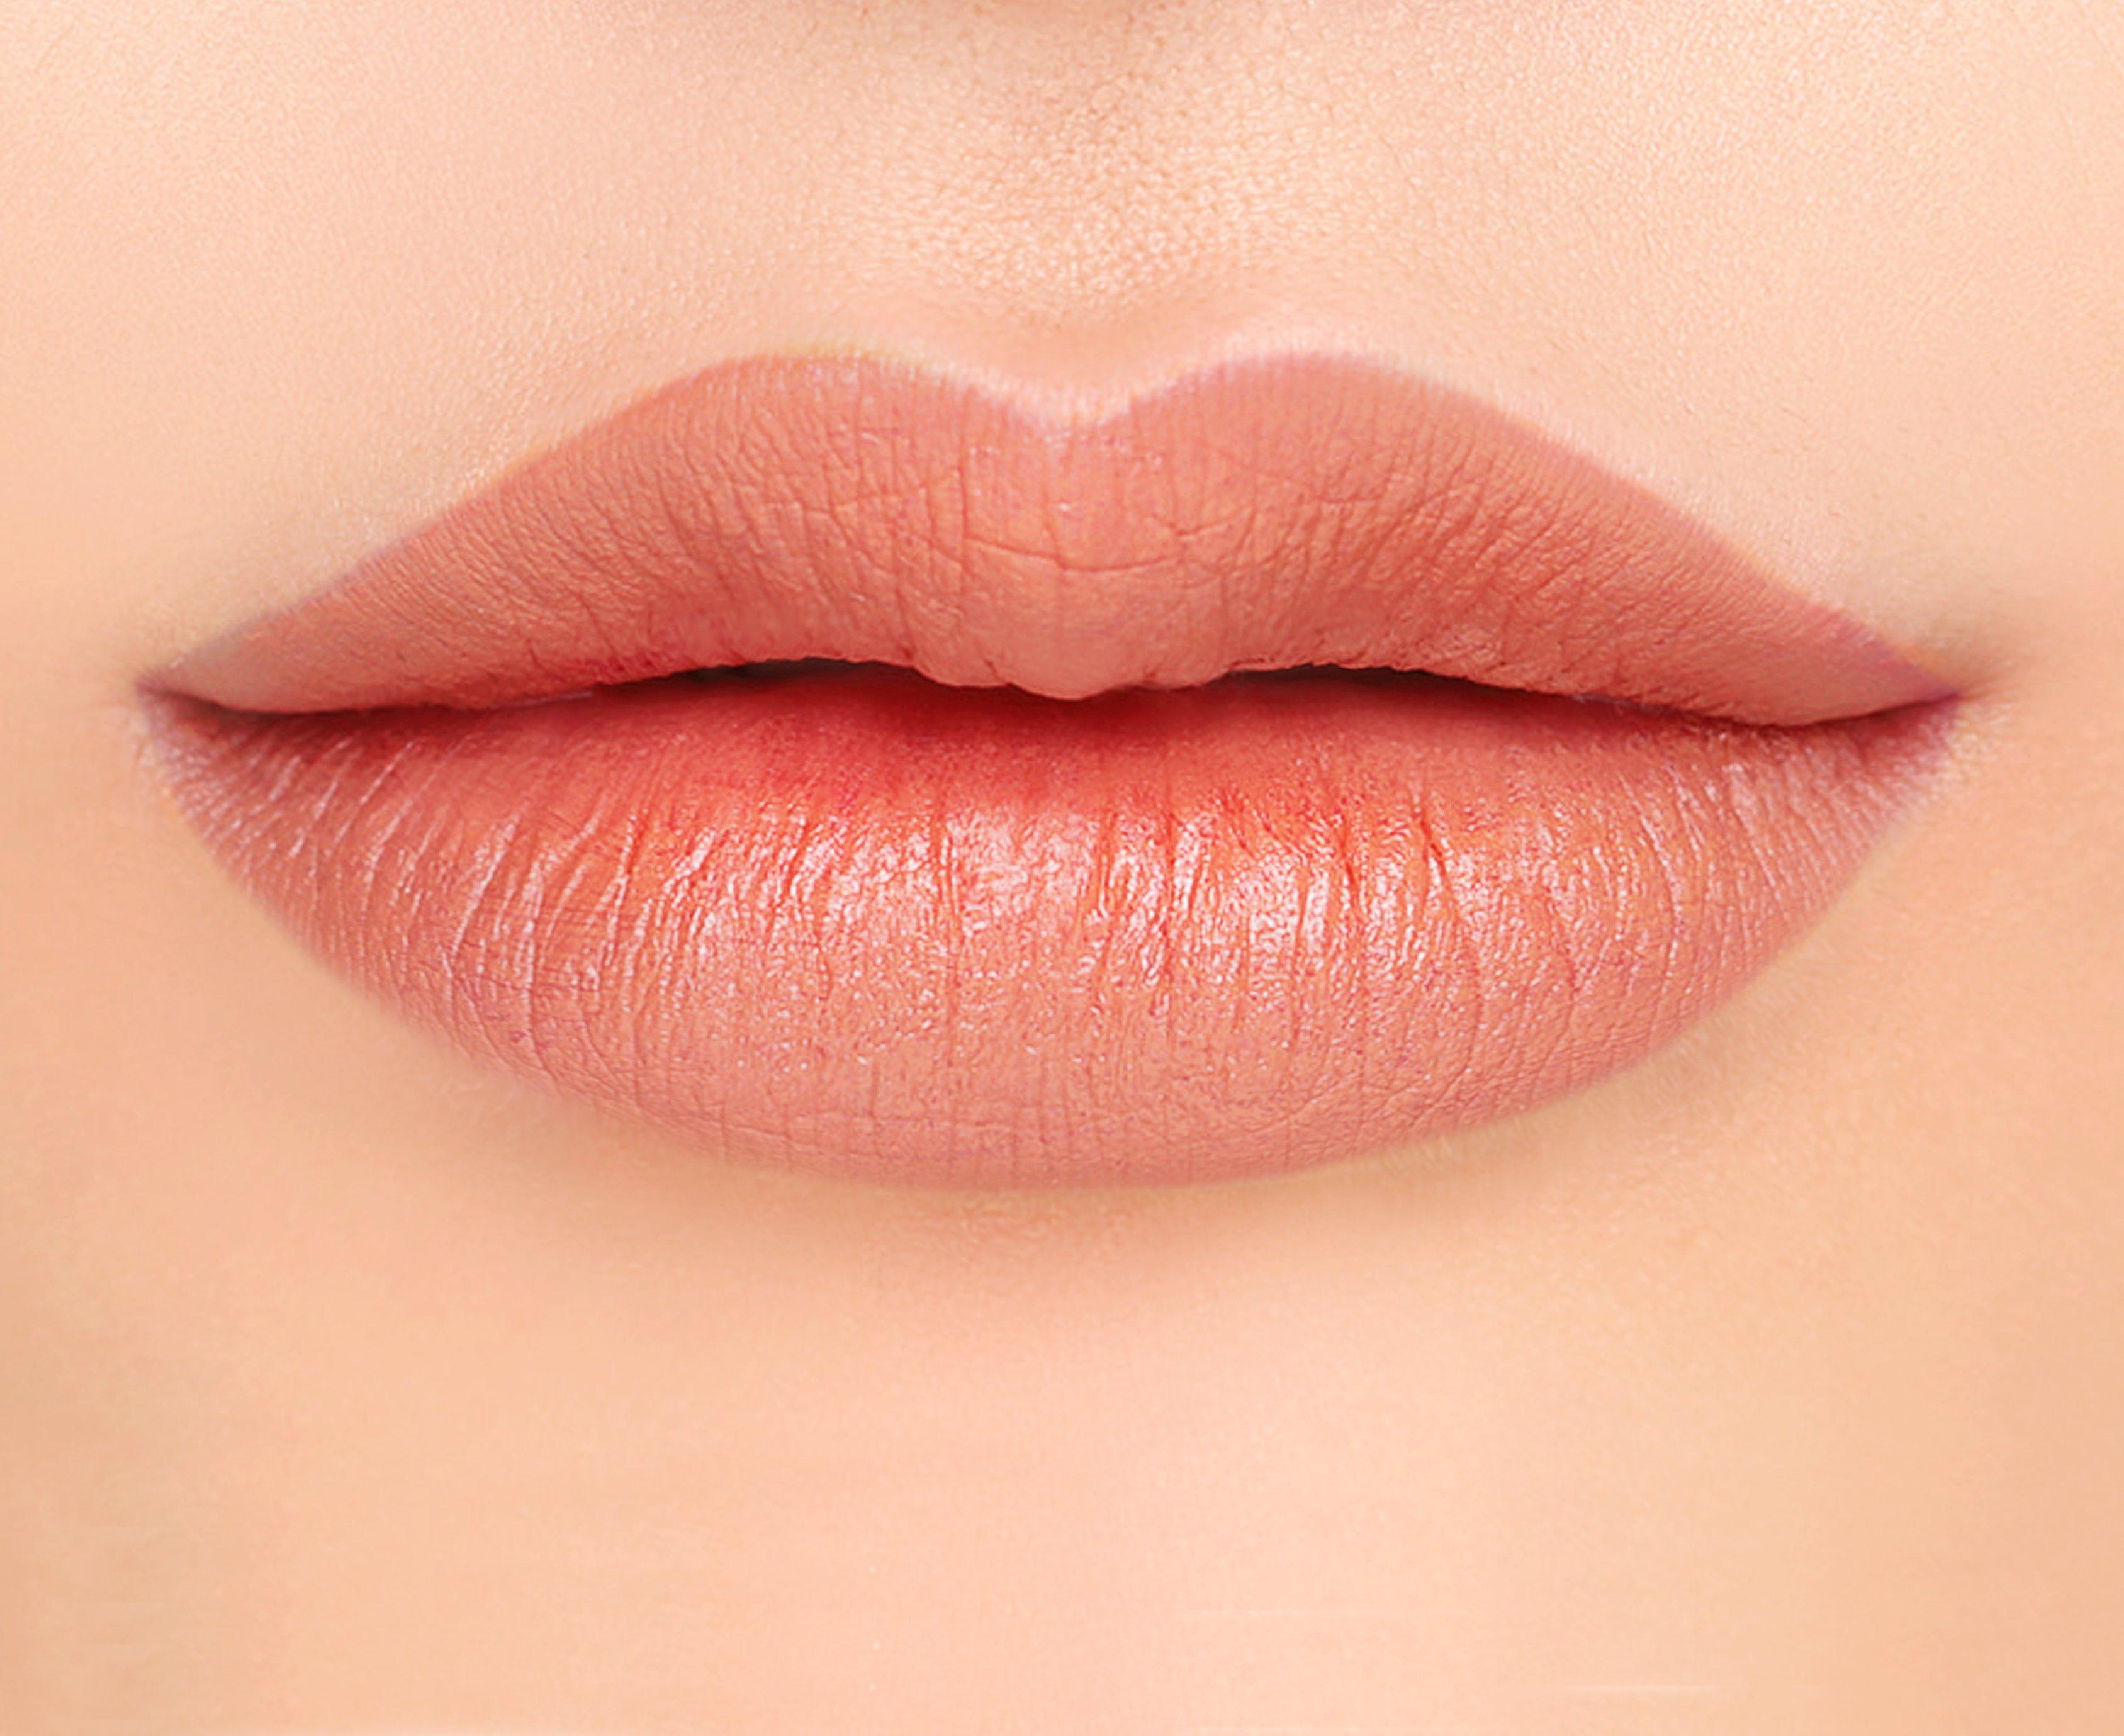 Son Thỏi Lì Cosluxe Curve Lipstick Sexy Creamy Nude 2.5g